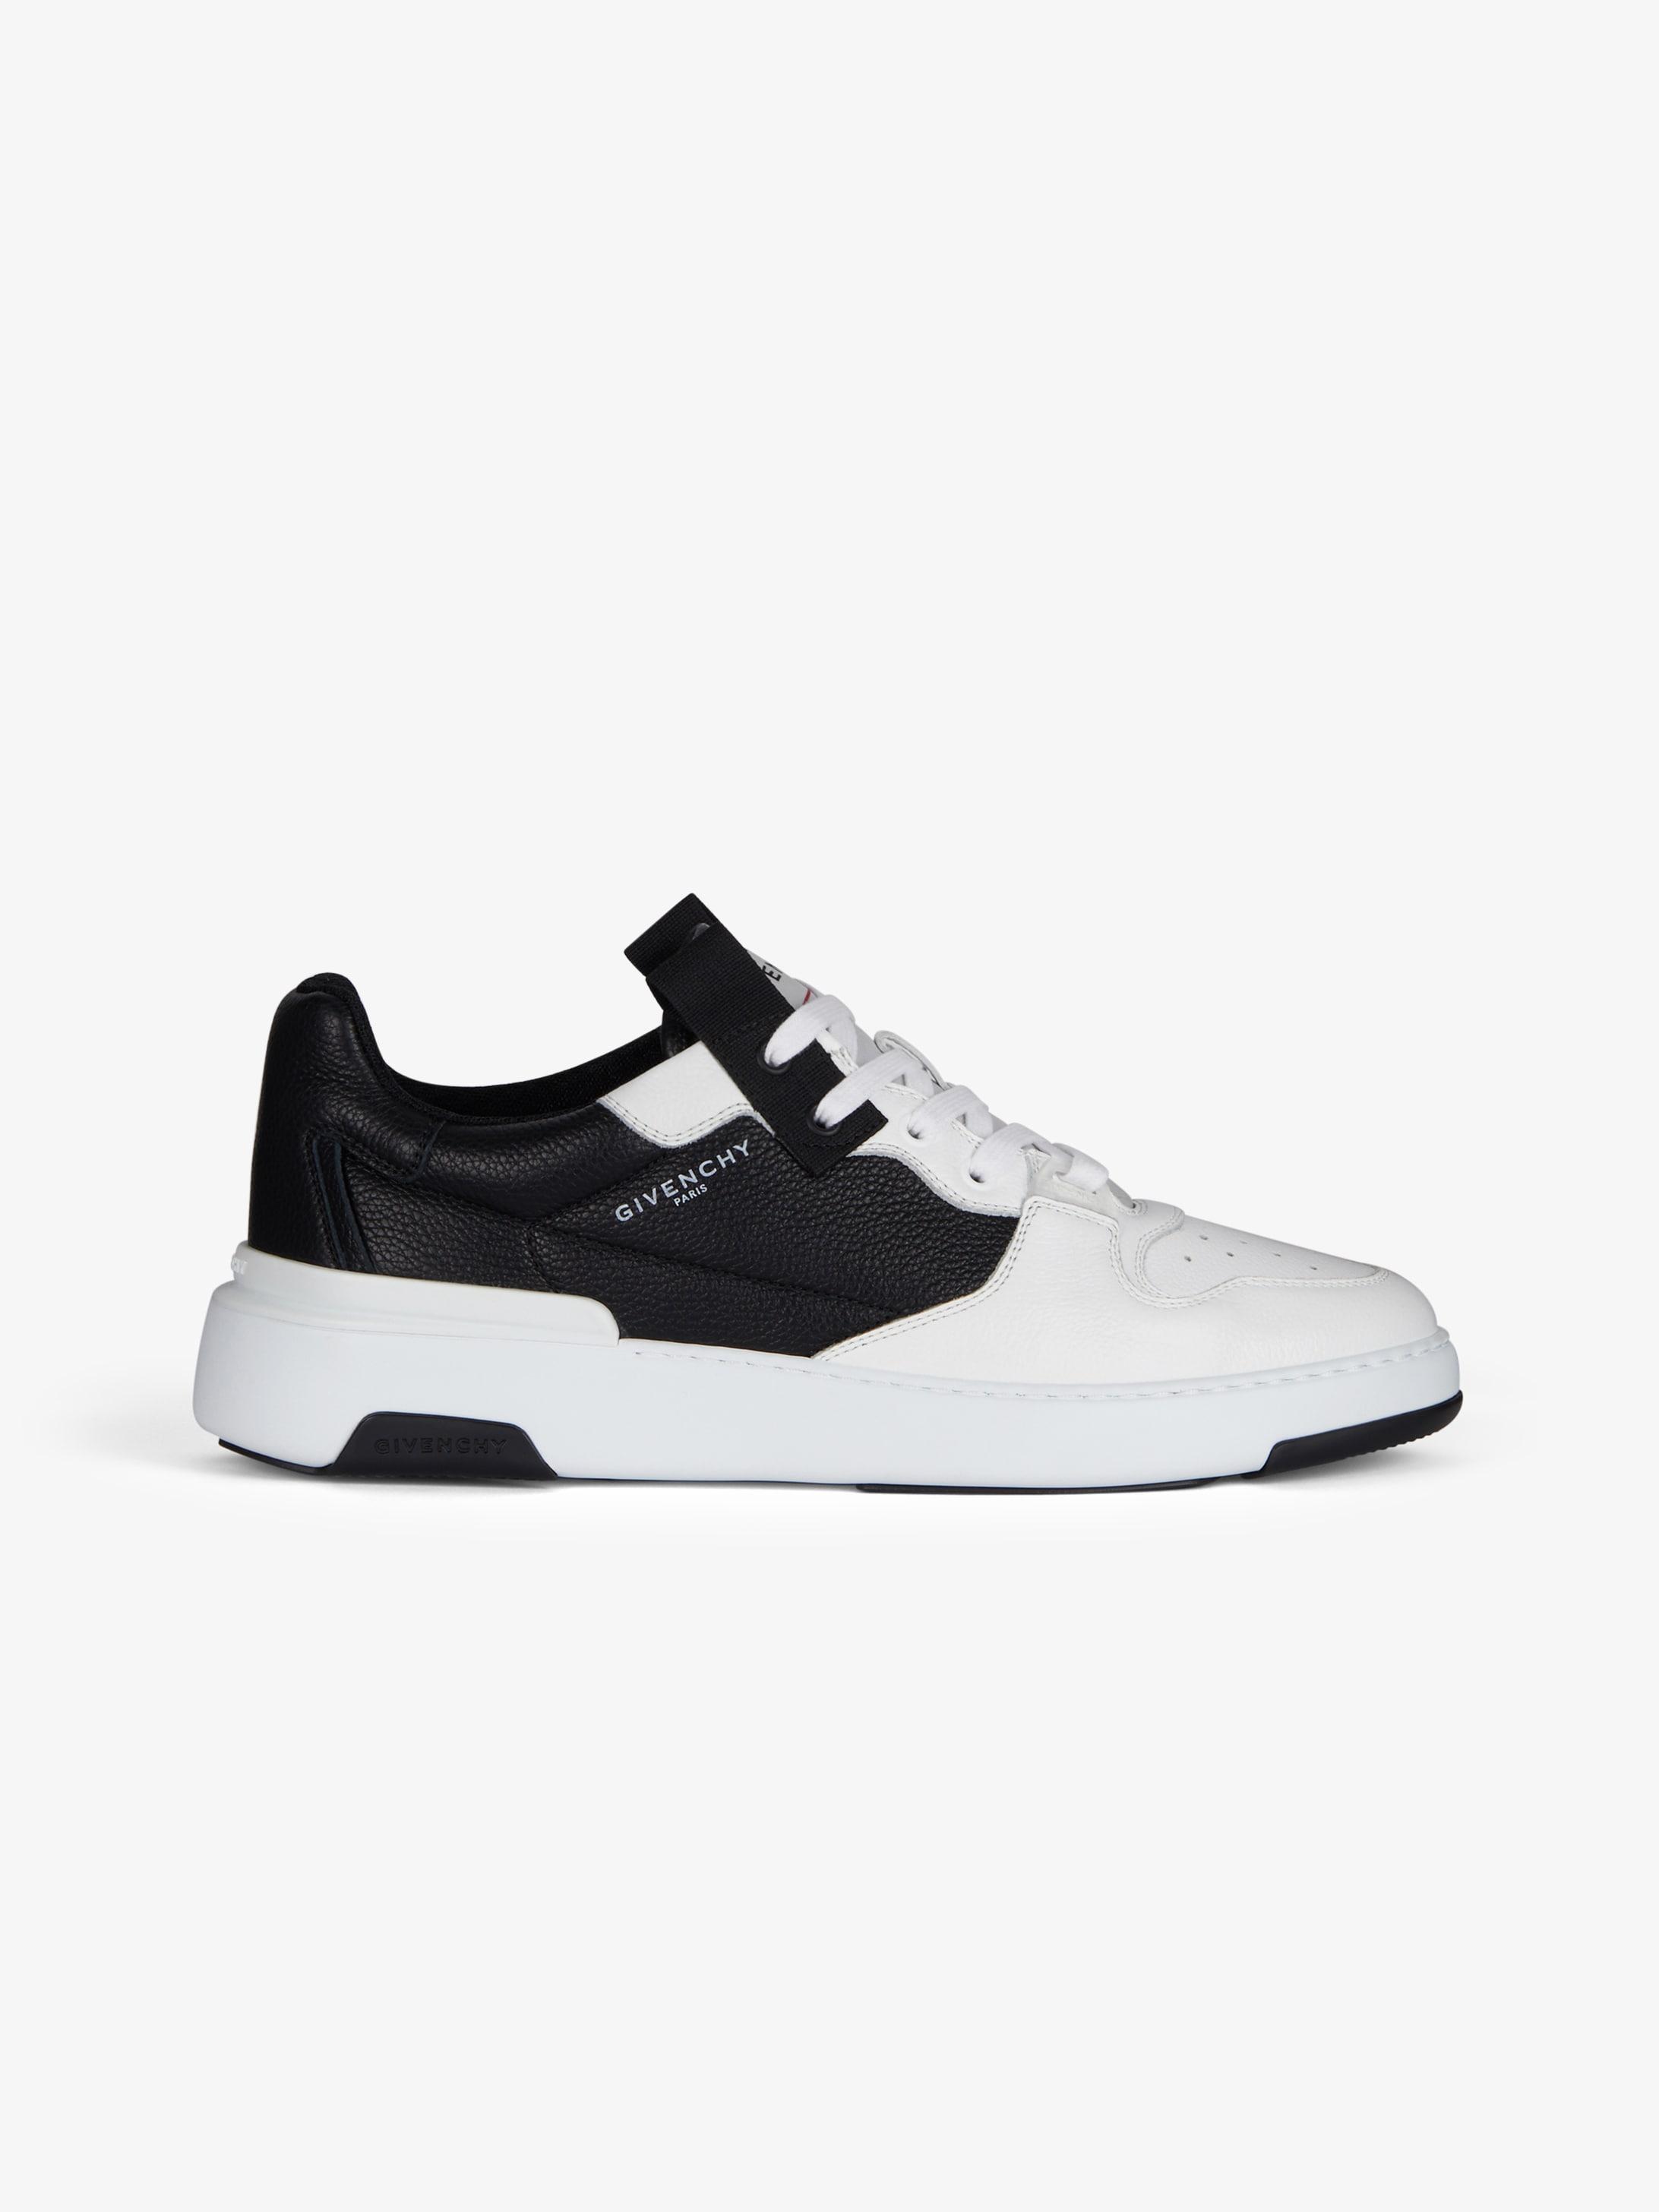 Wing low asymmetric sneakers in leather